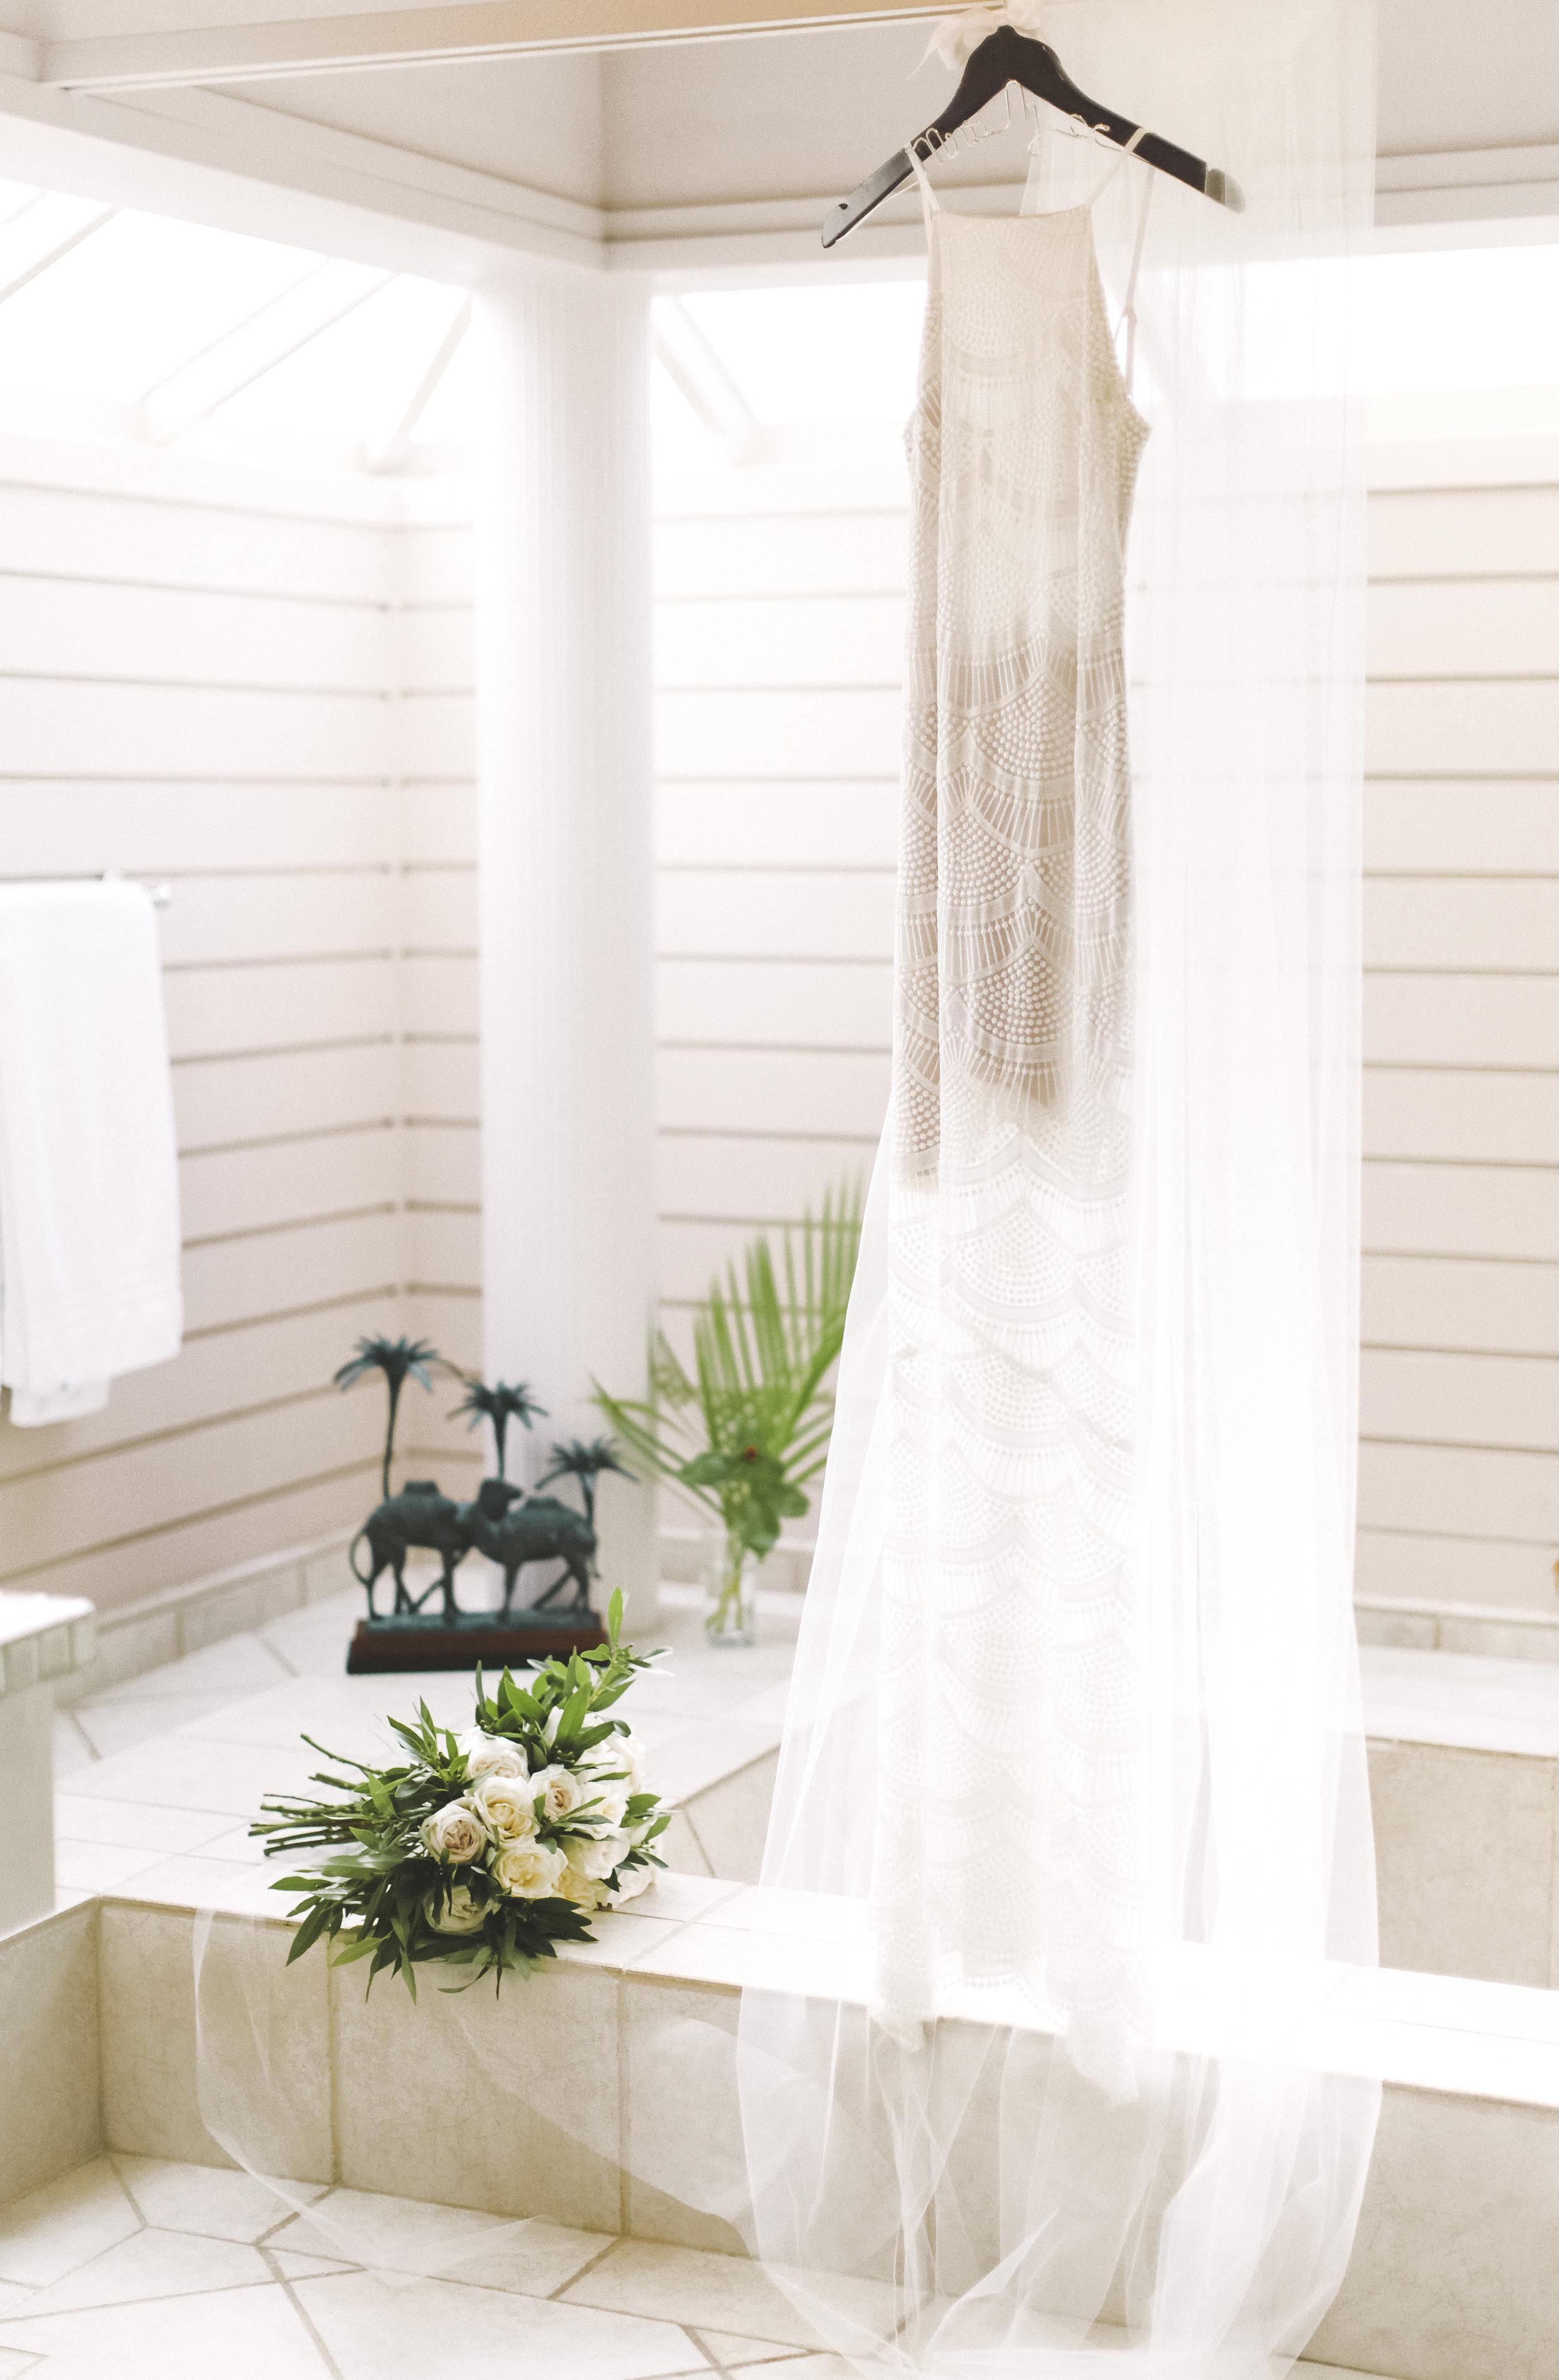 angie-diaz-photography-hawaii-wedding-4.jpg